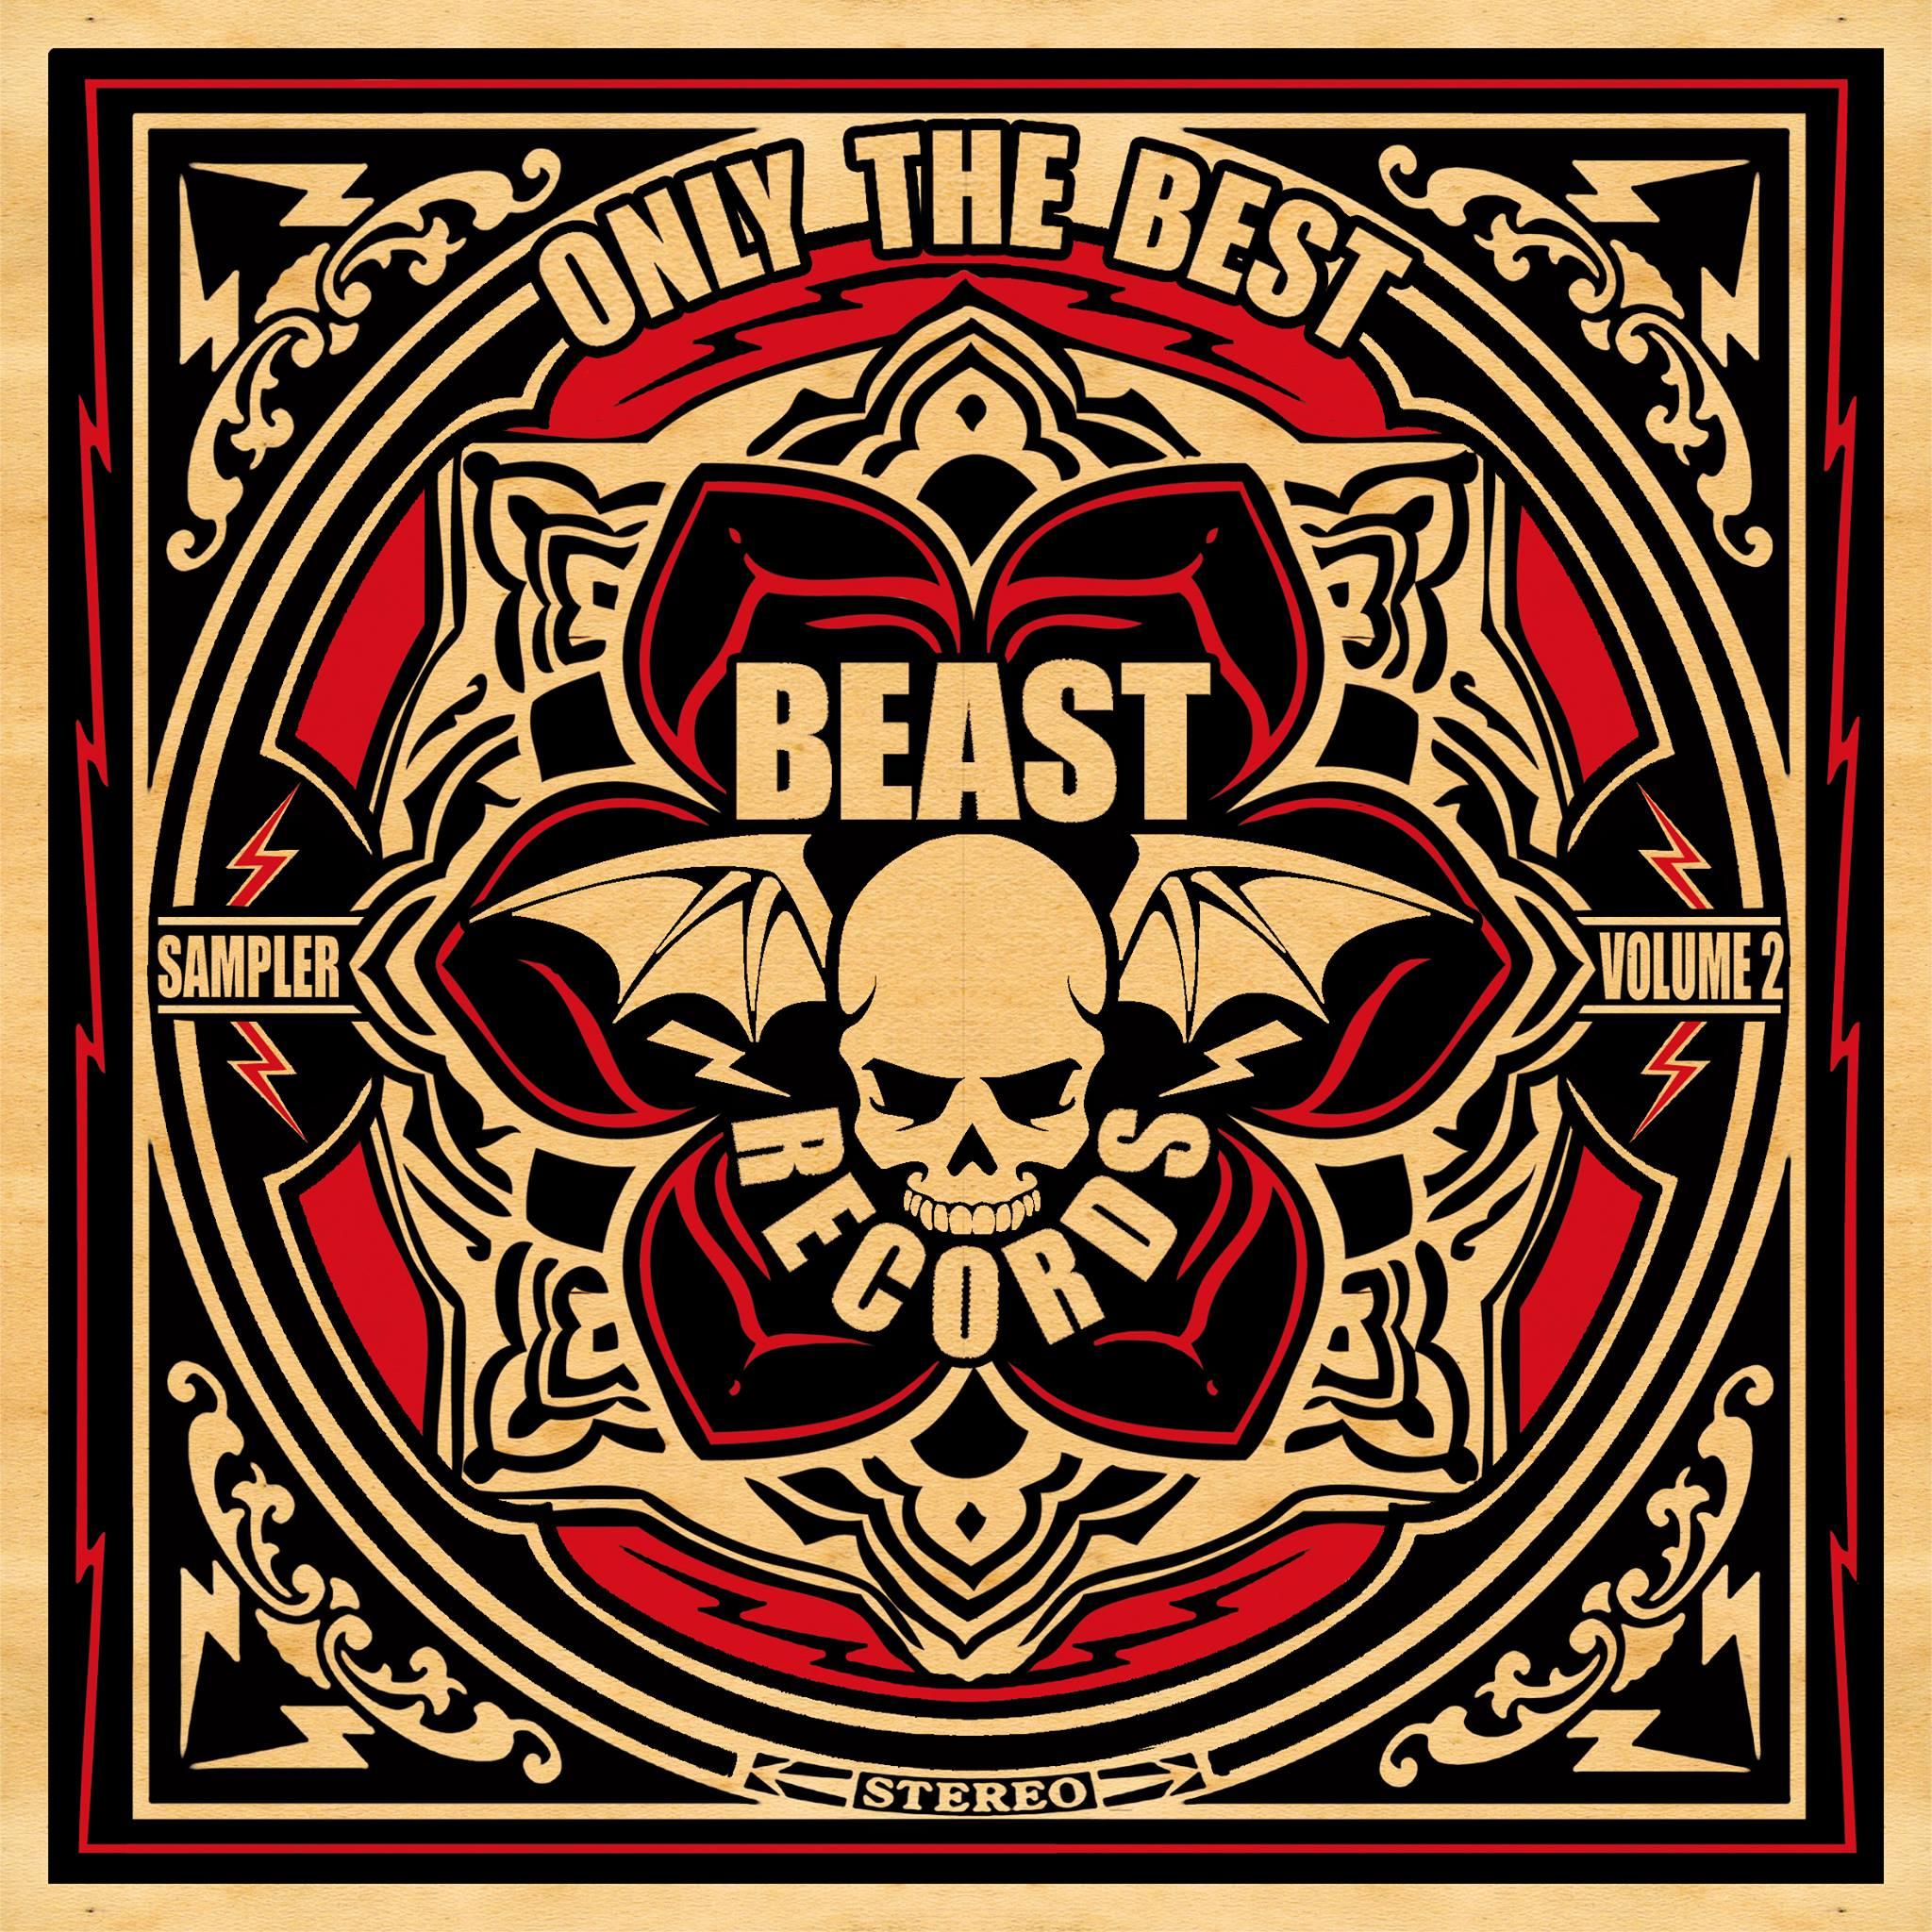 Beast comp.jpg